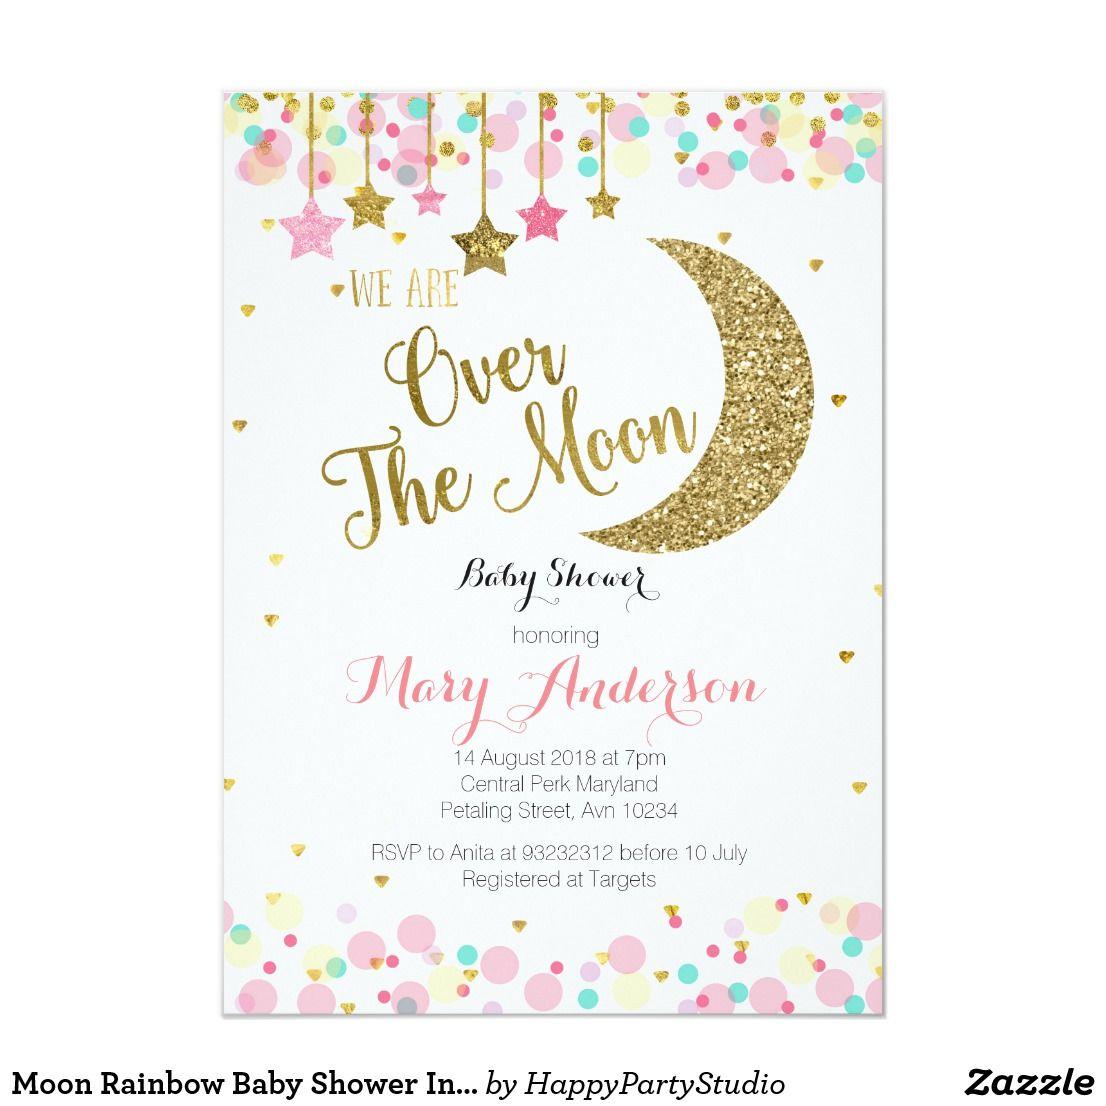 Moon Rainbow Baby Shower Invitation